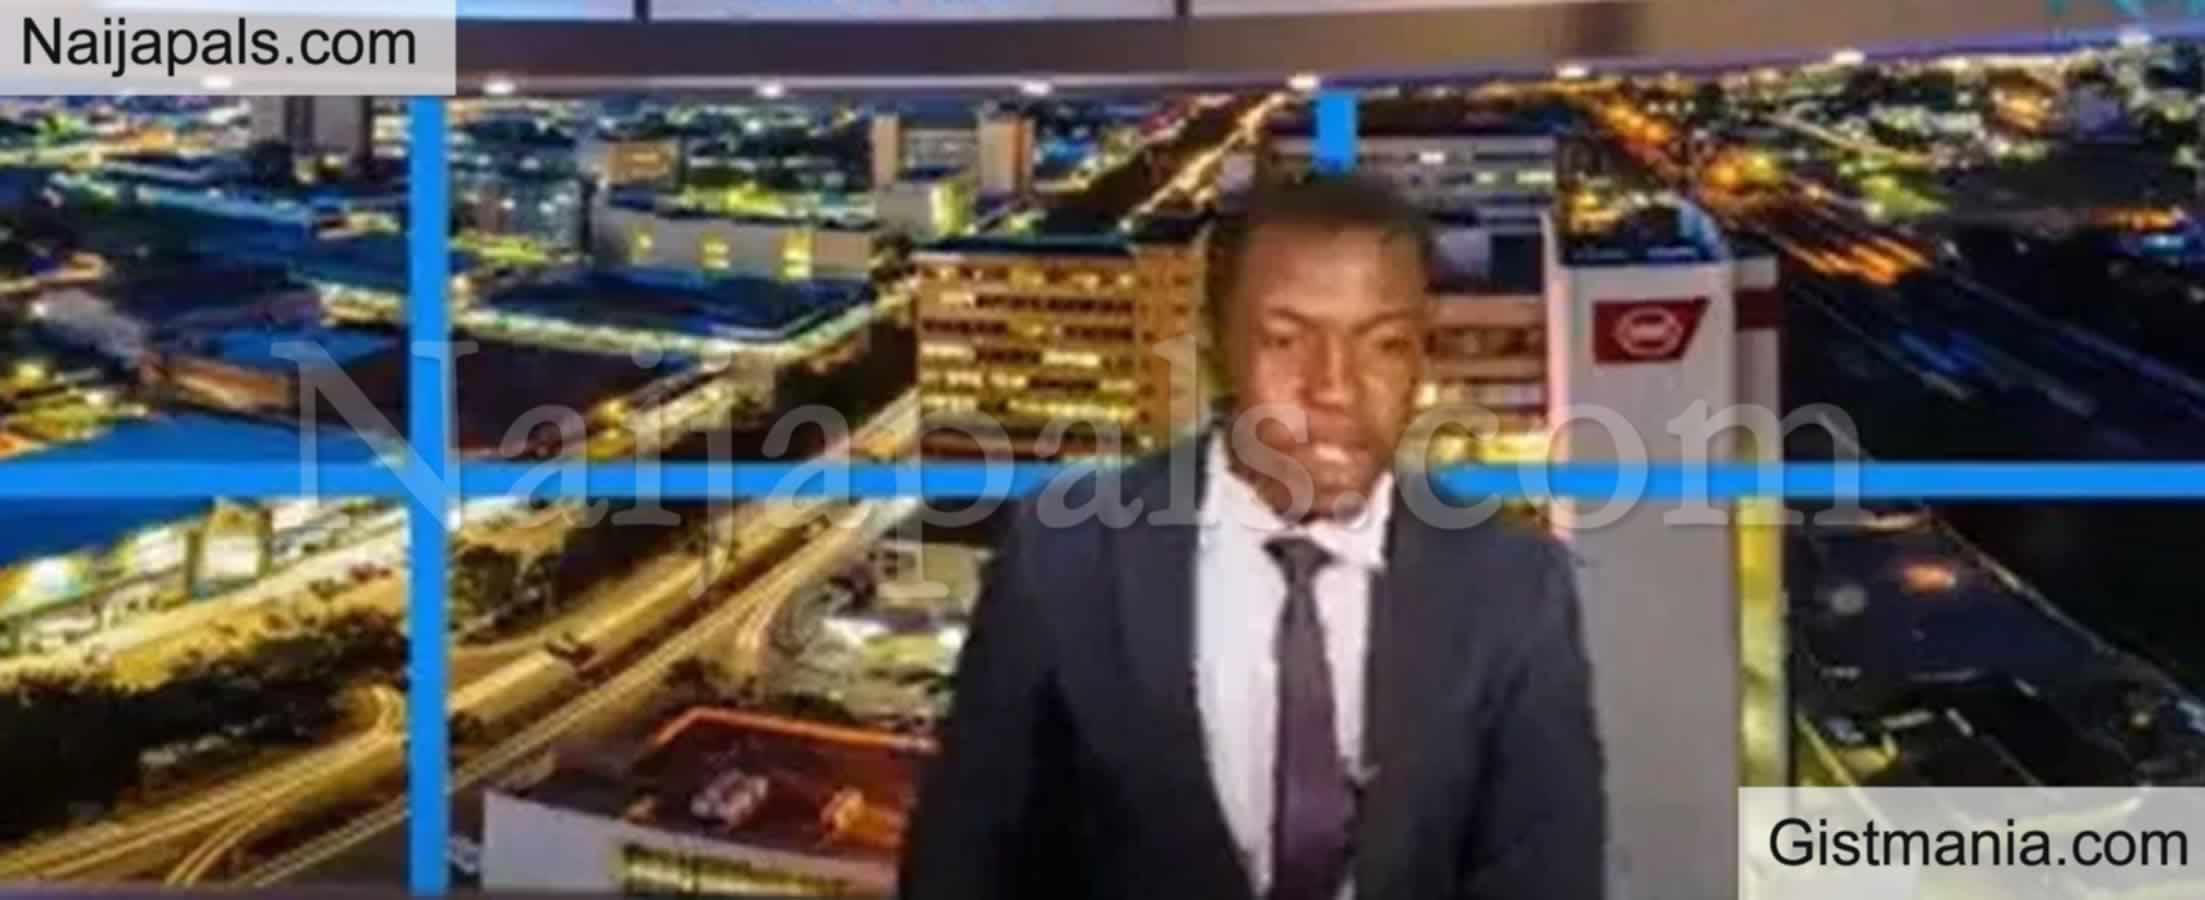 <img alt='.' class='lazyload' data-src='https://img.gistmania.com/emot/video.gif' /> Zambian <b>TV Presenter Demands For His Salary During Live News Report</b> (VIDEO)